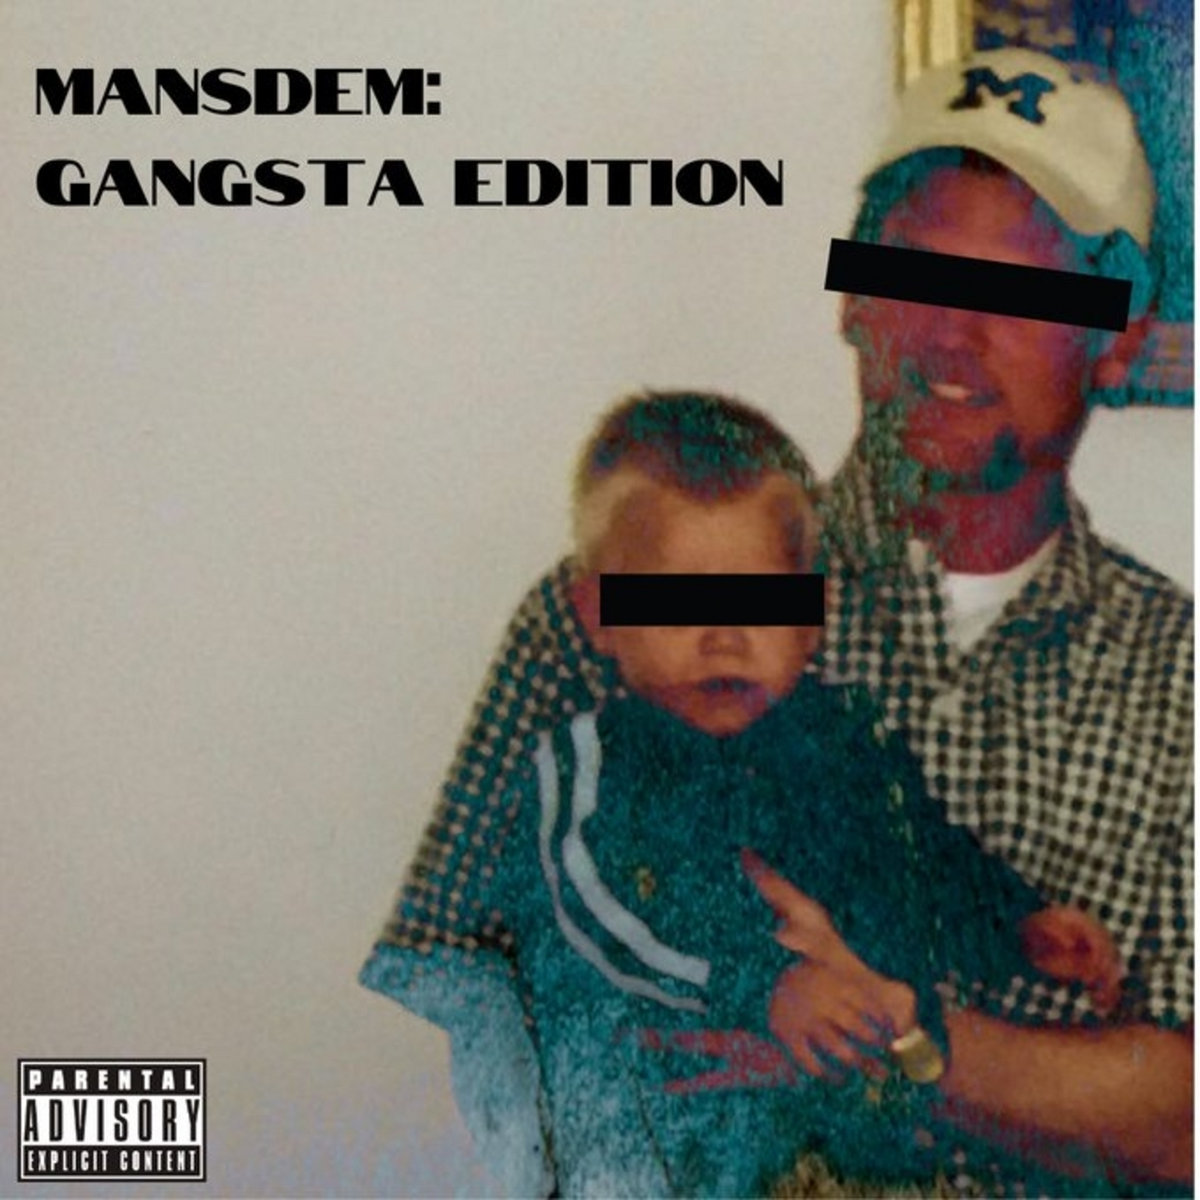 MANSDEM, Bloodblixing - MANSDEM: GANGSTA EDITION EP